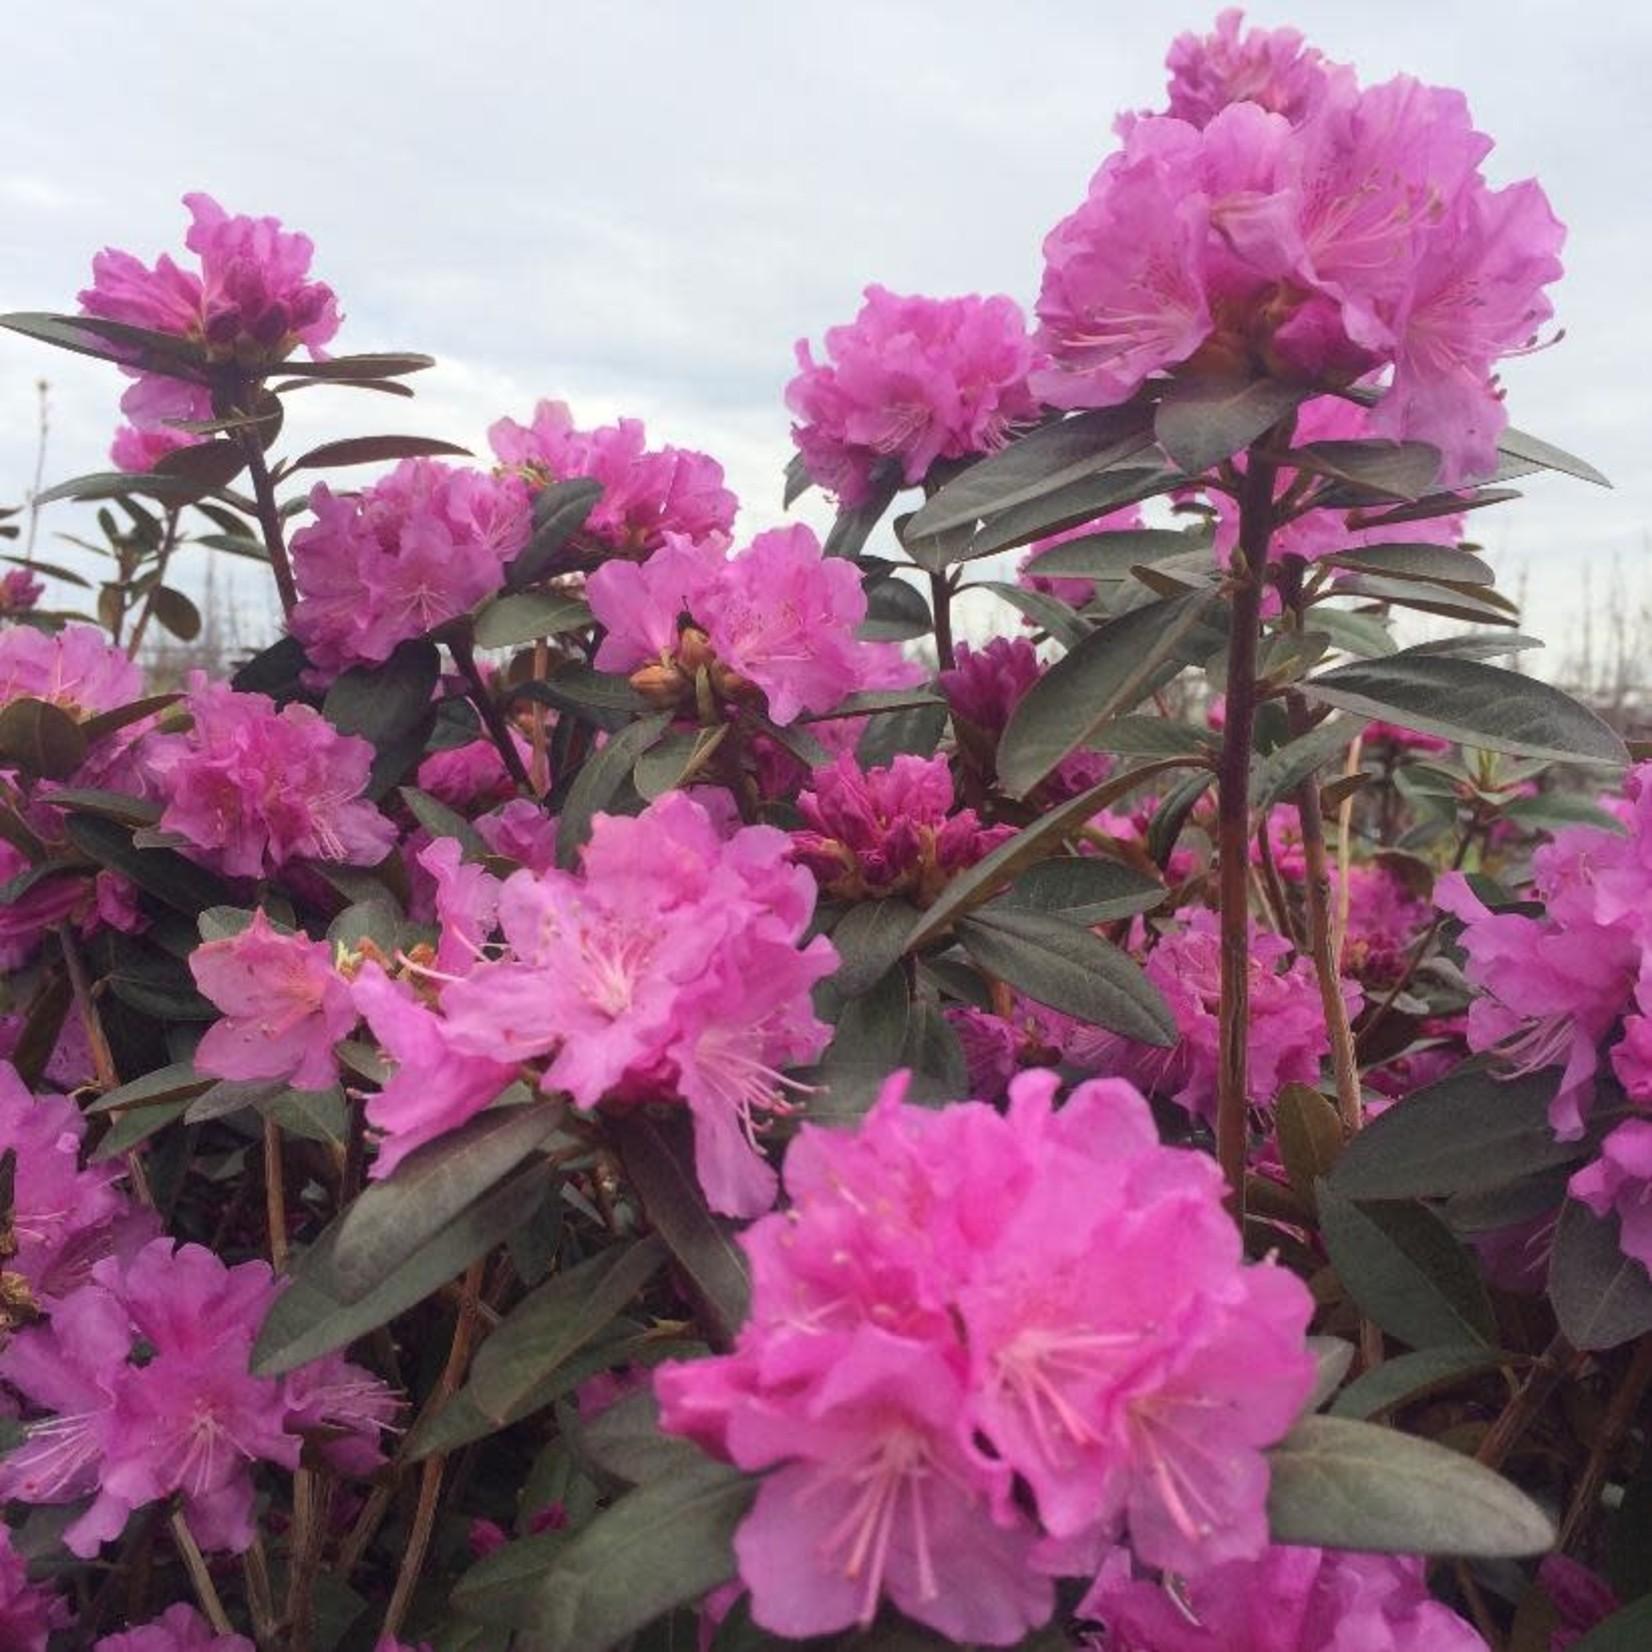 Rhododendron 'P.J.M. elite' - 3 gal